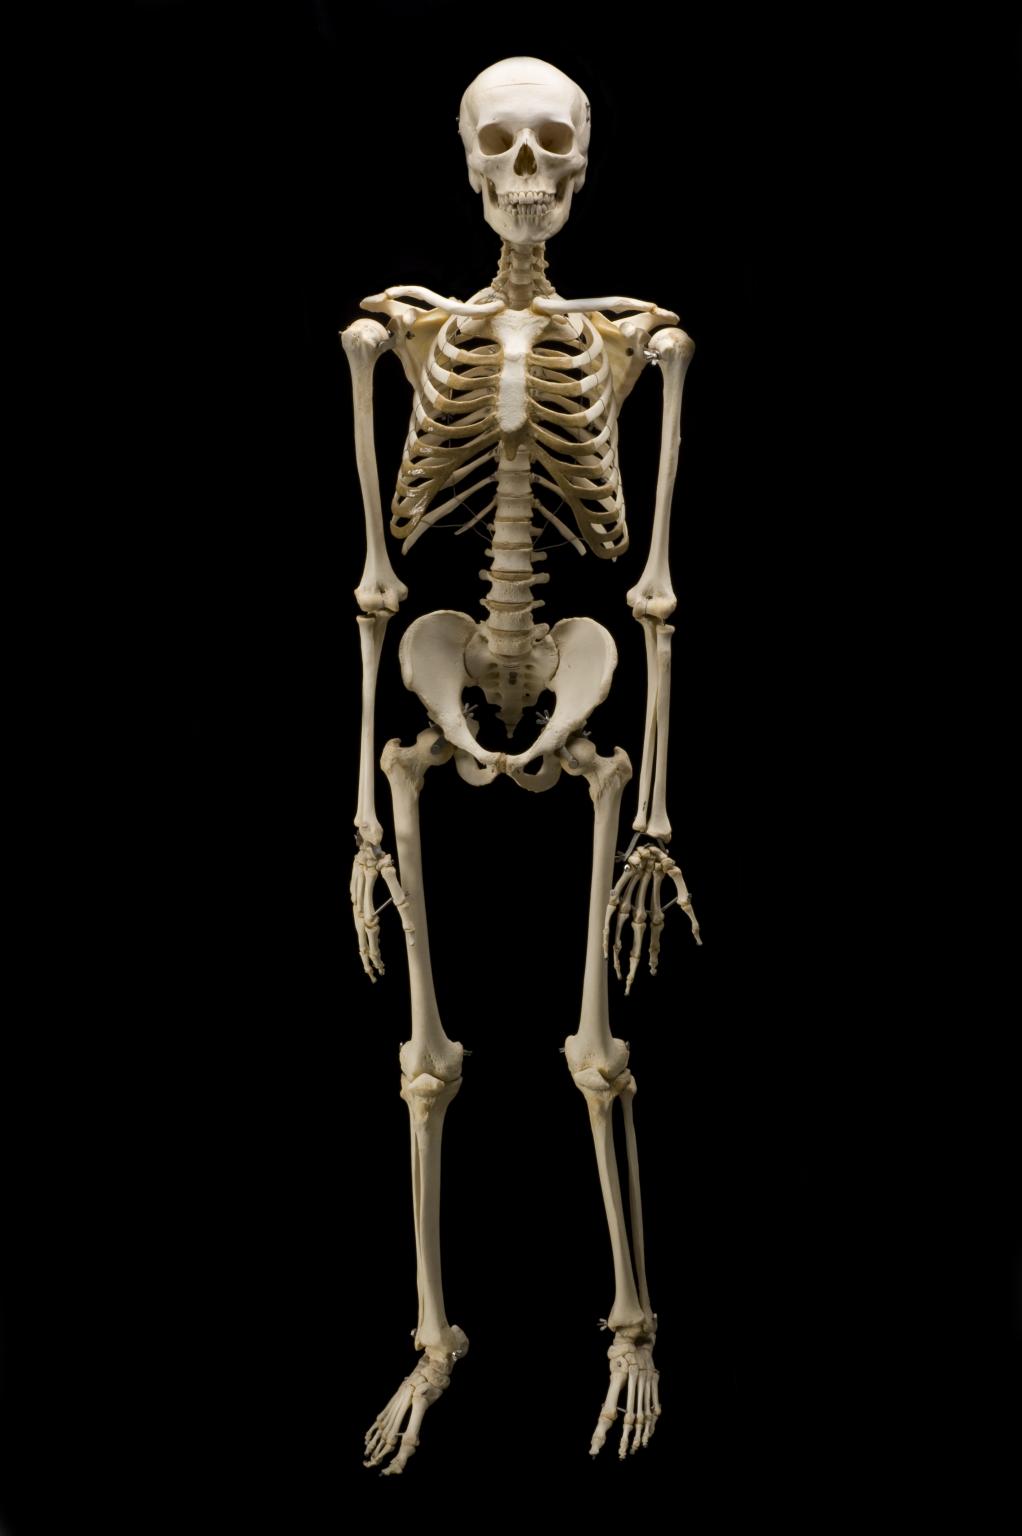 real skeleton - Google Search   Tattoo ideas   Pinterest ...